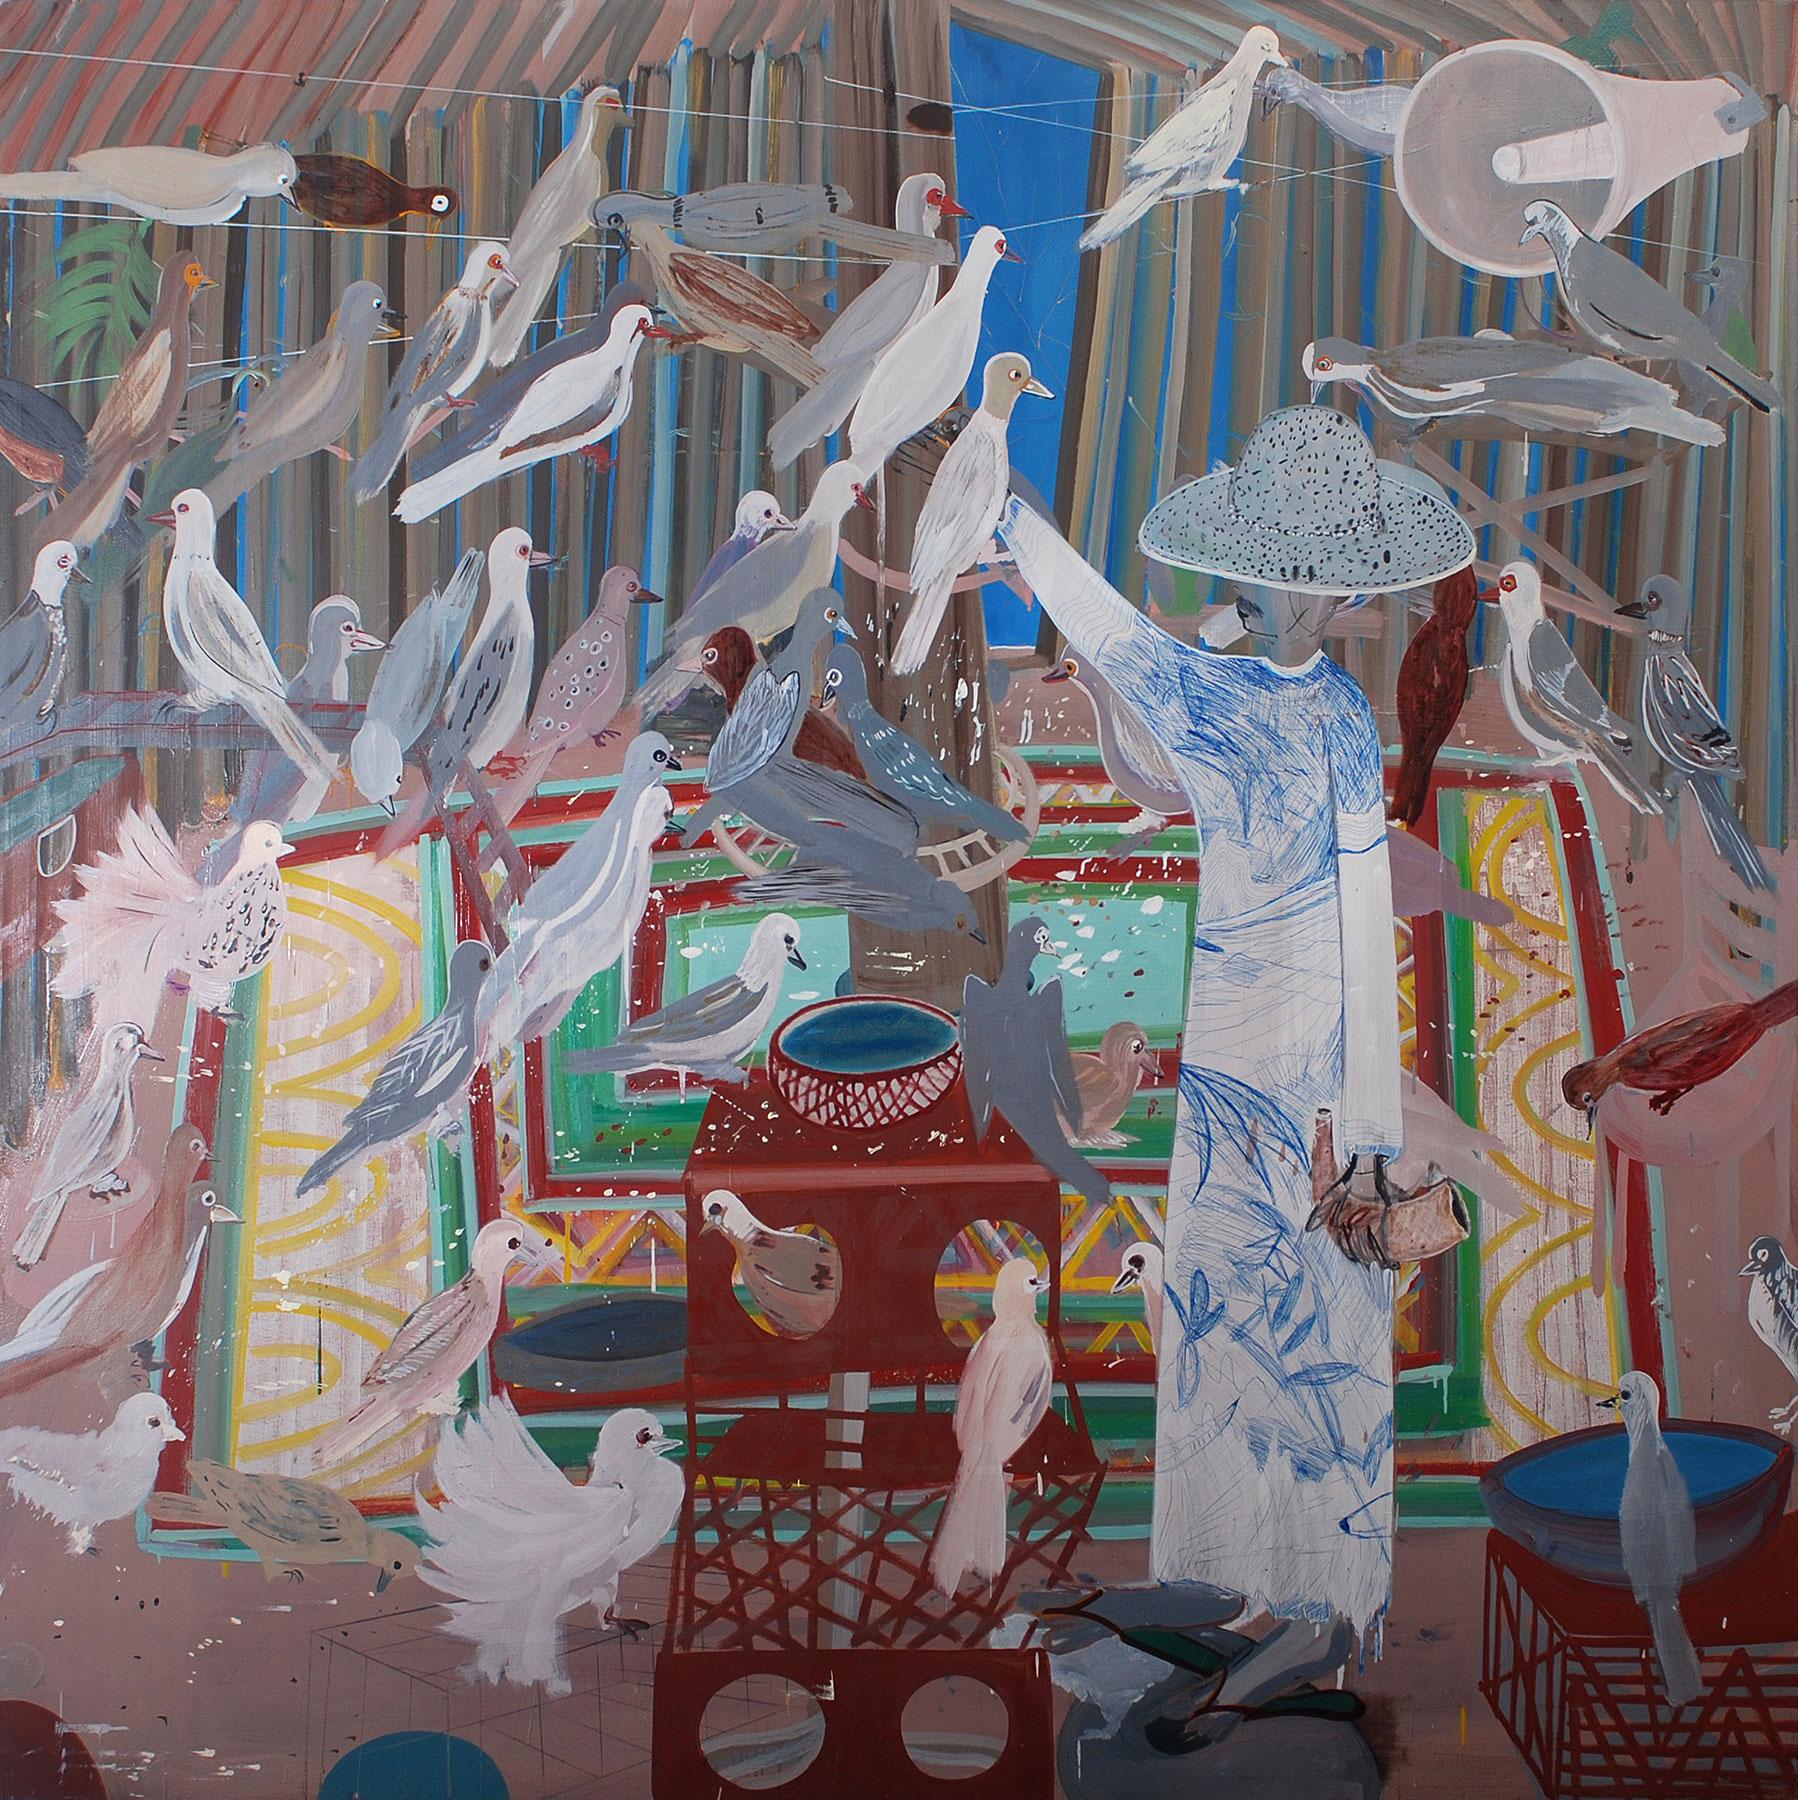 Postman, 2010    Oil on canvas, 207x210 cm